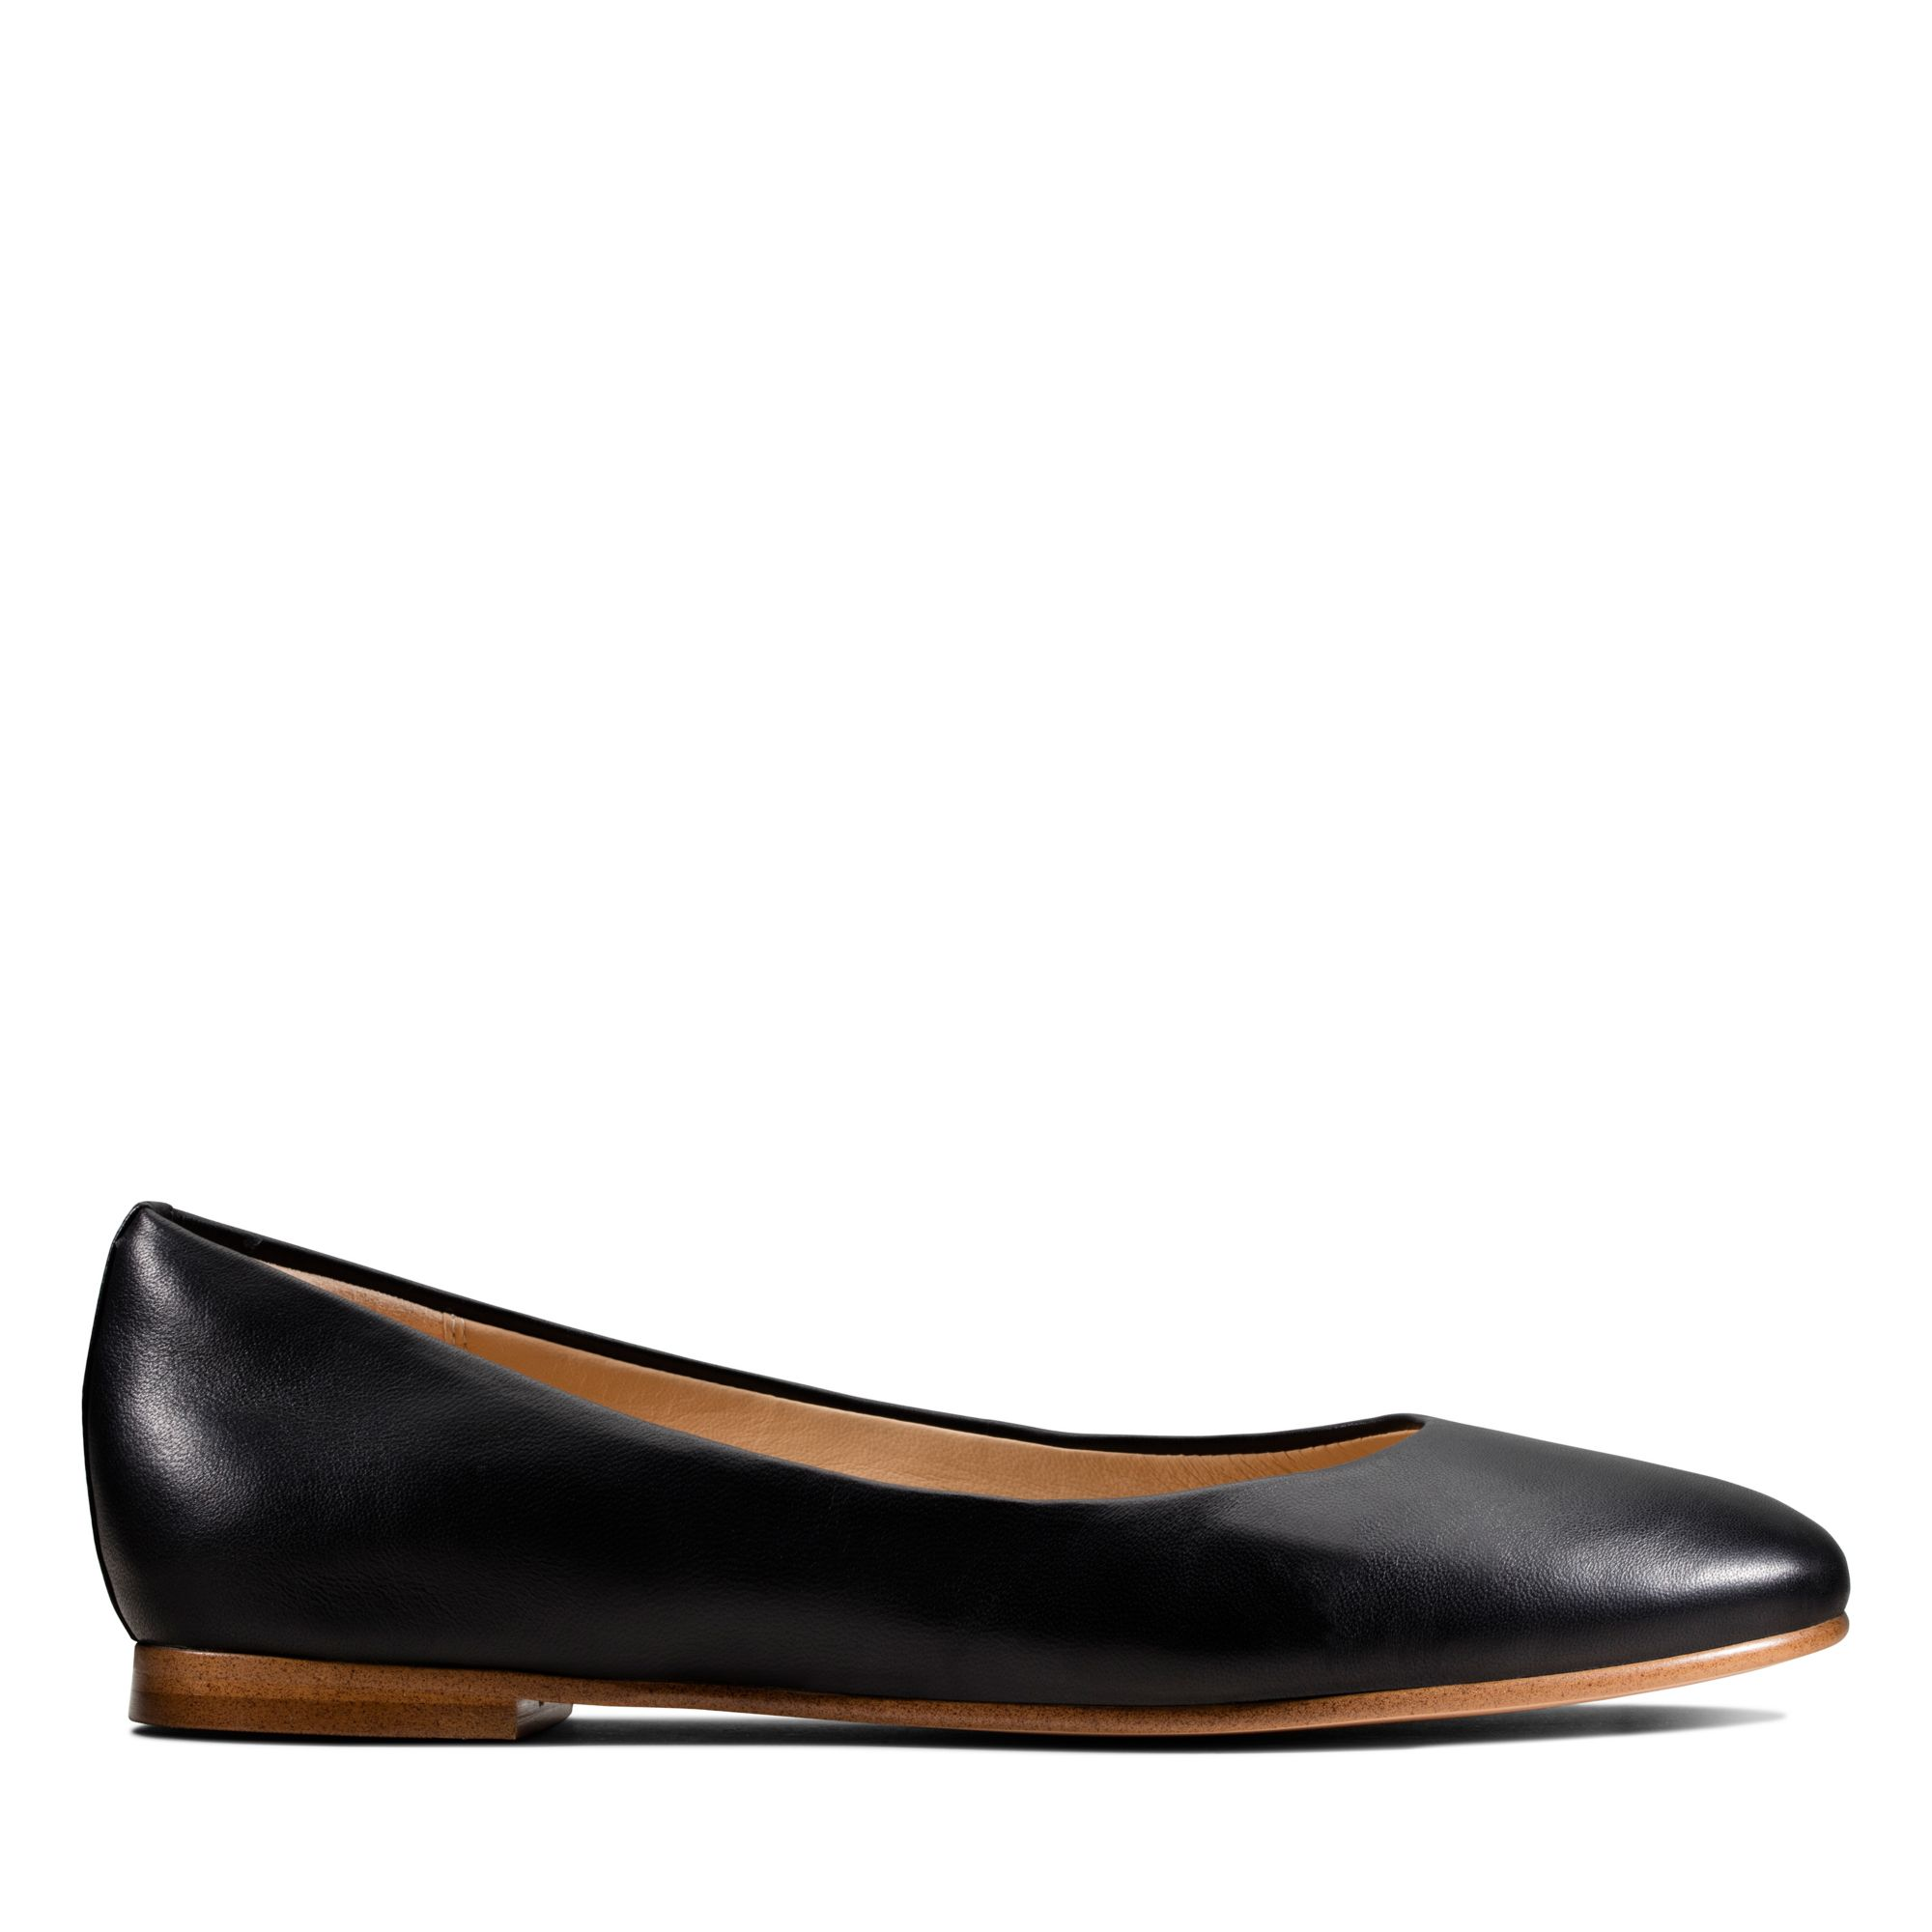 Clarks純甄至柔-Grace Piper芭蕾平底鞋(黑色)